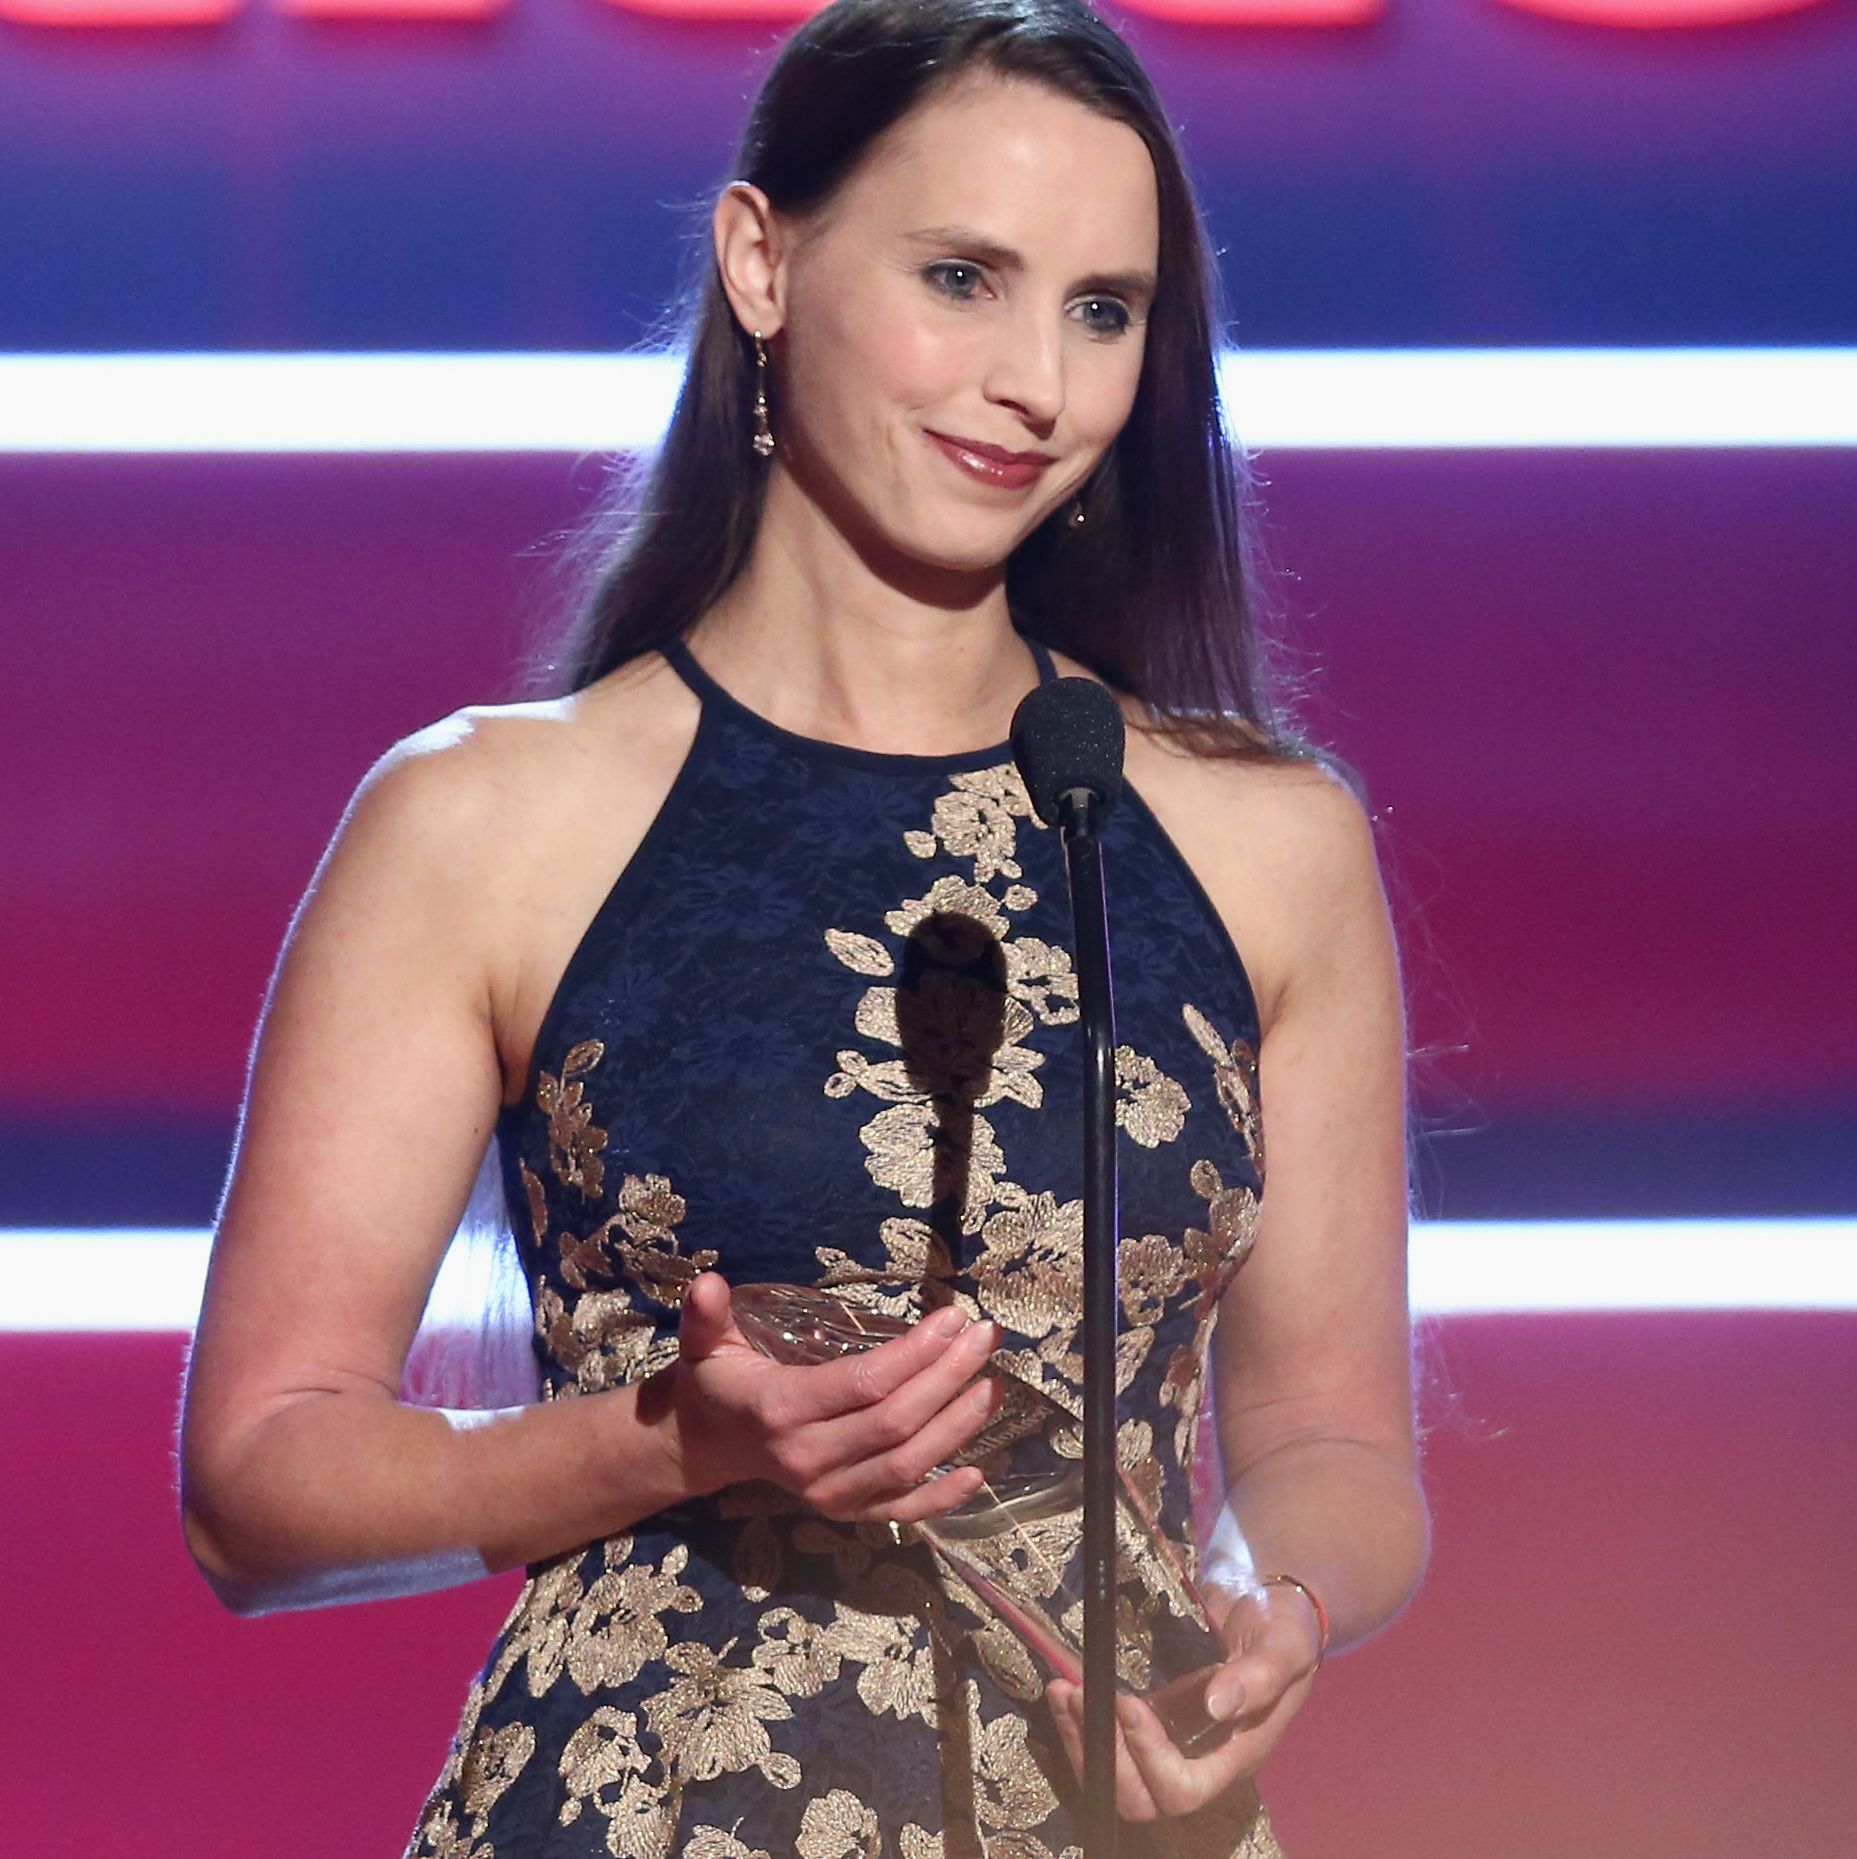 Dr. Christine Blasey Ford Presents Rachael Denhollander With Inspiration Award in Emotional Video